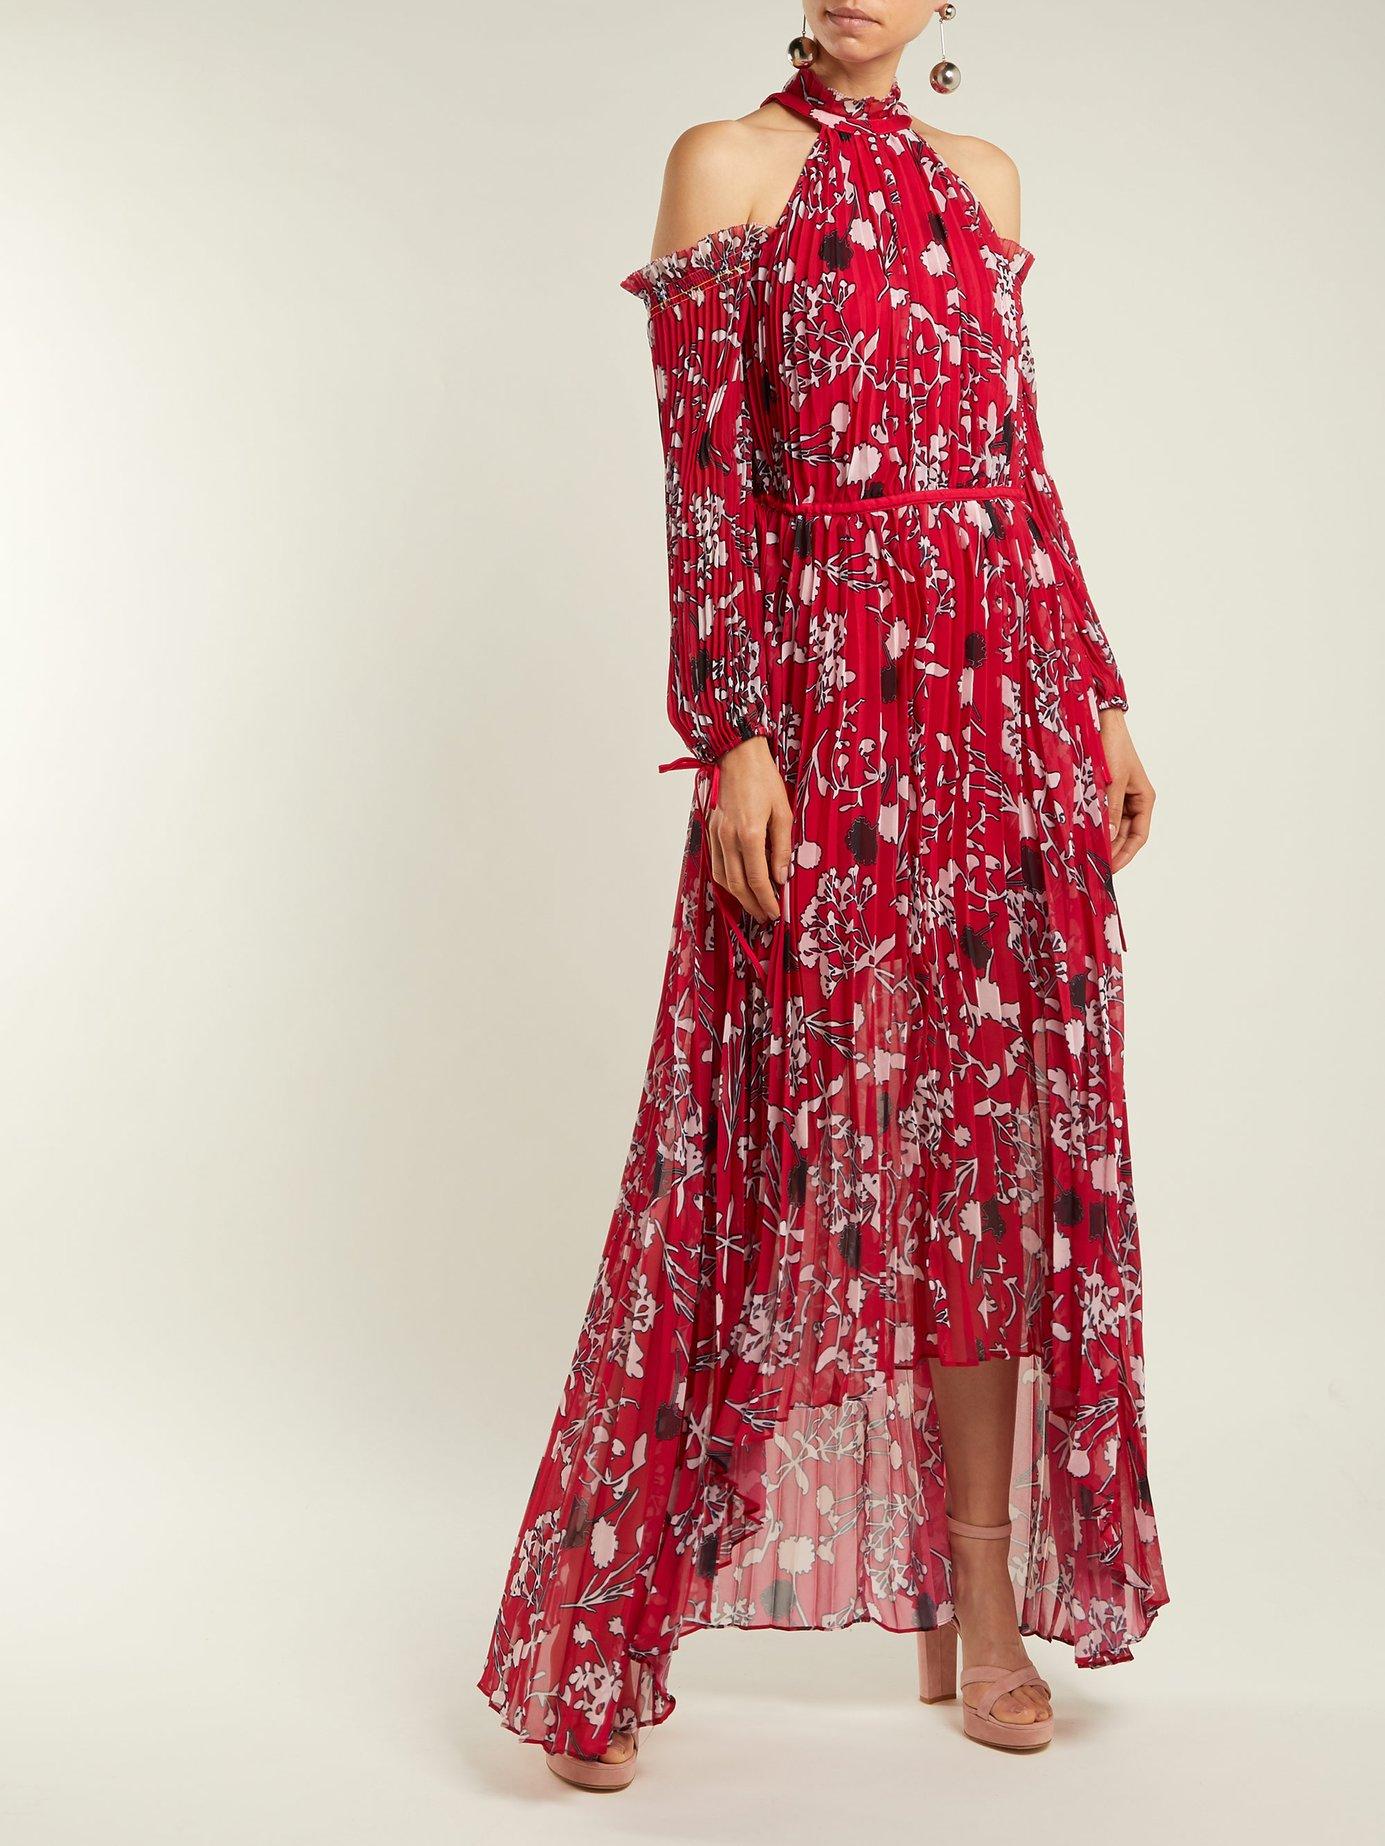 Floral print pleated midi dress by Self-Portrait